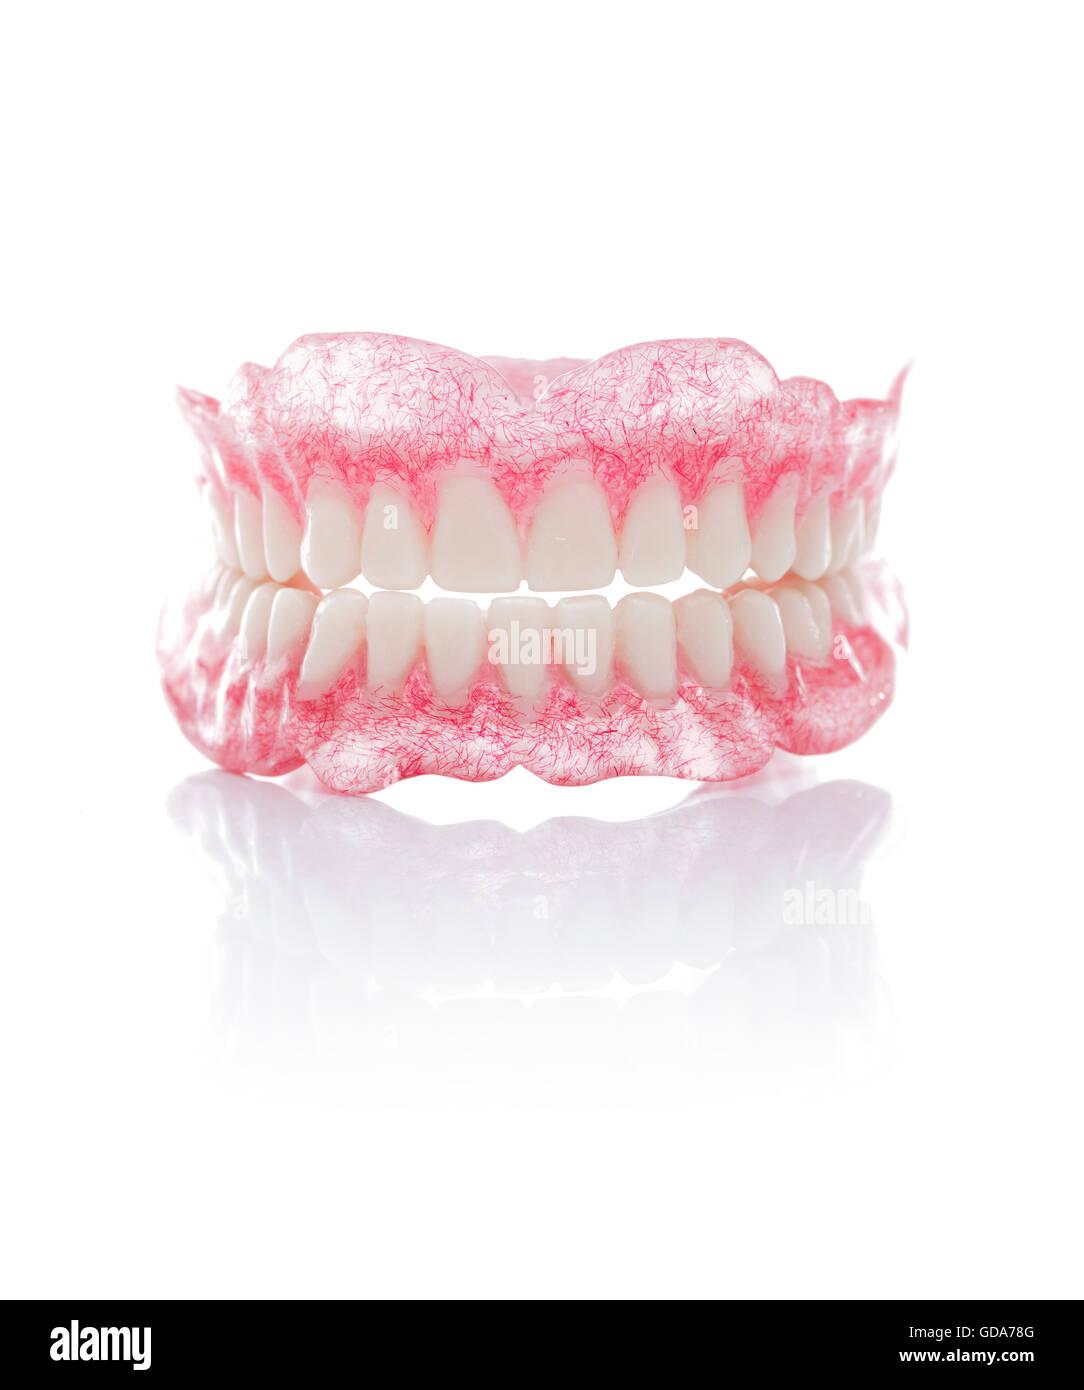 A Set of Full Dentures Isolated on White Background - Stock Image